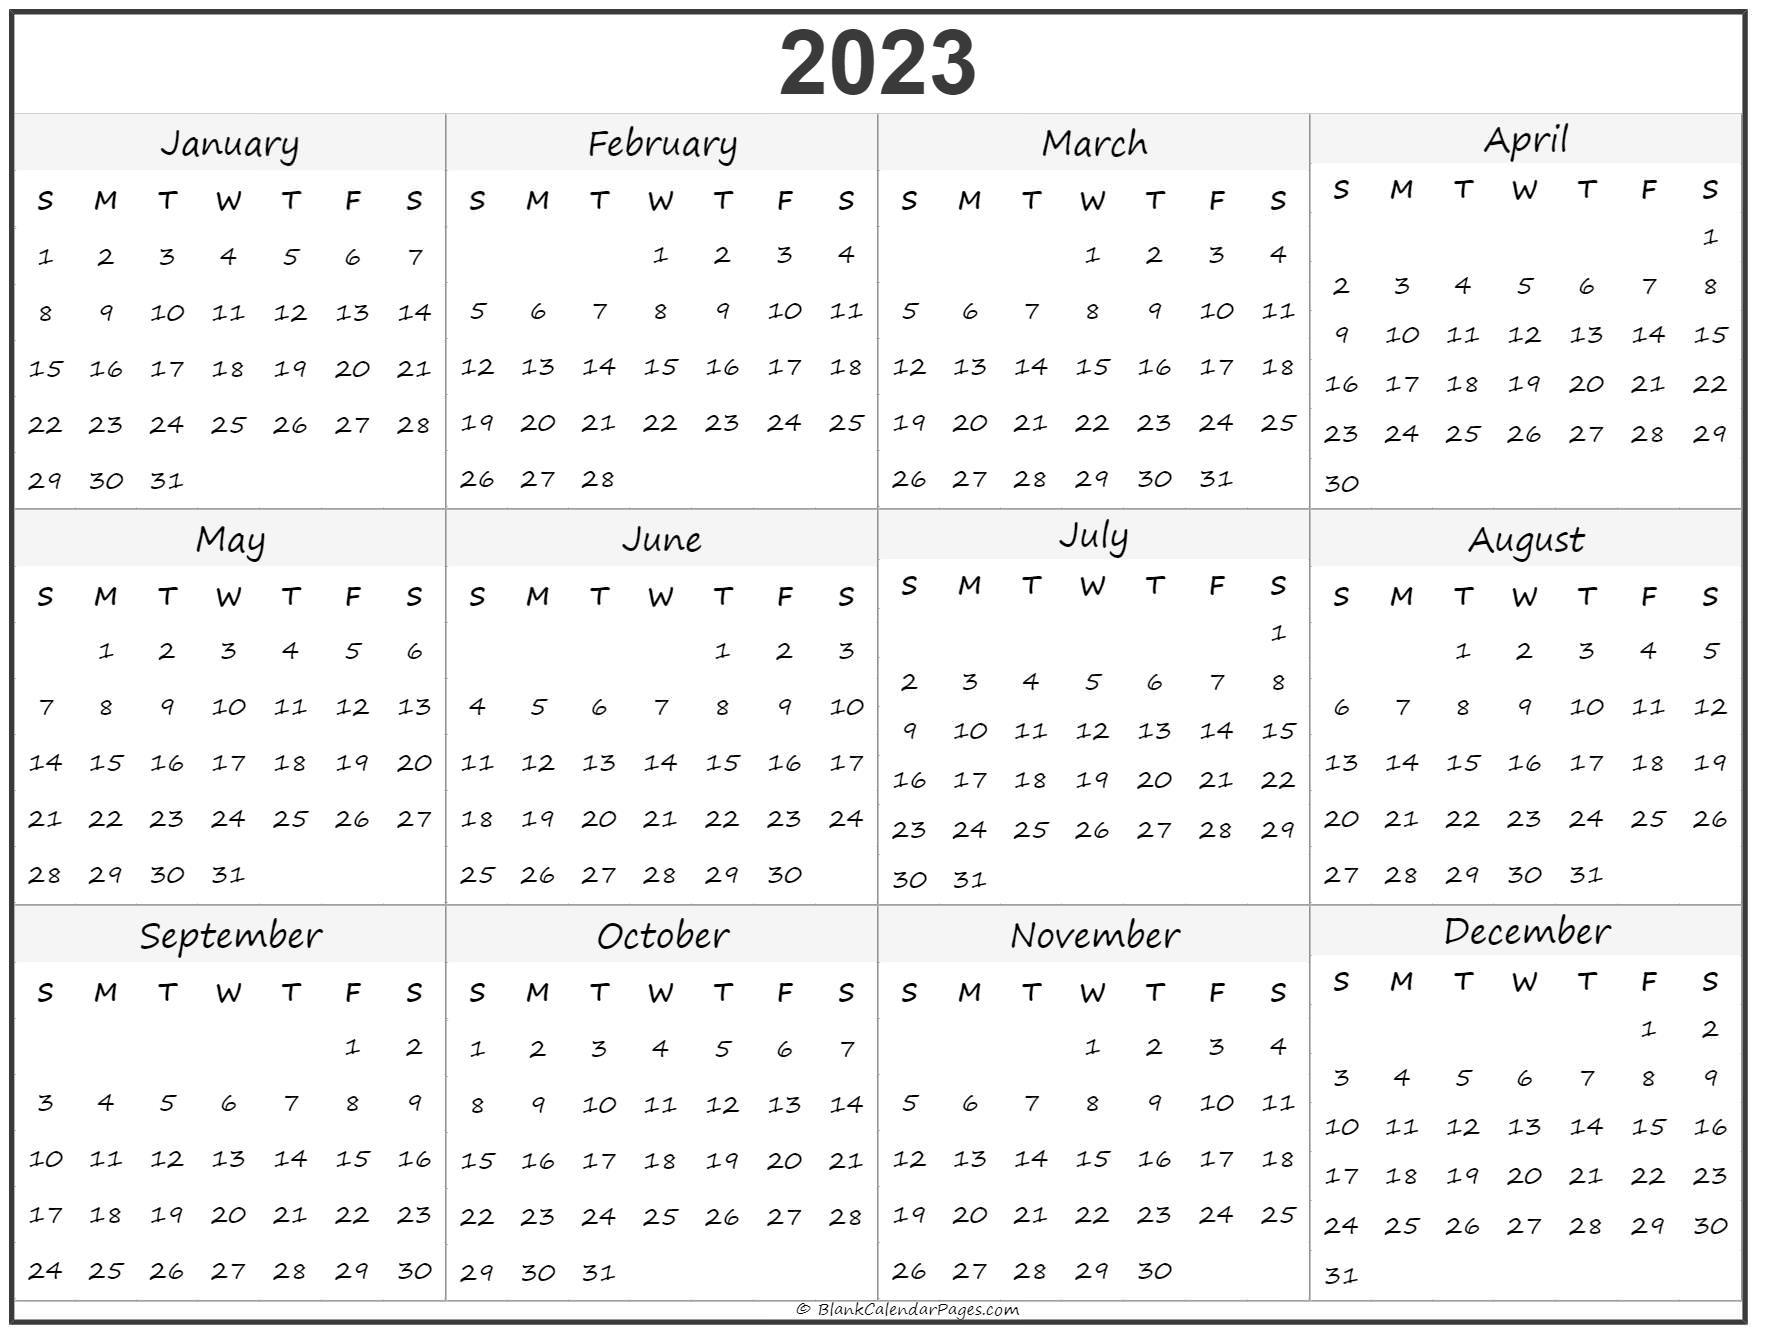 Yearly calendar 2023